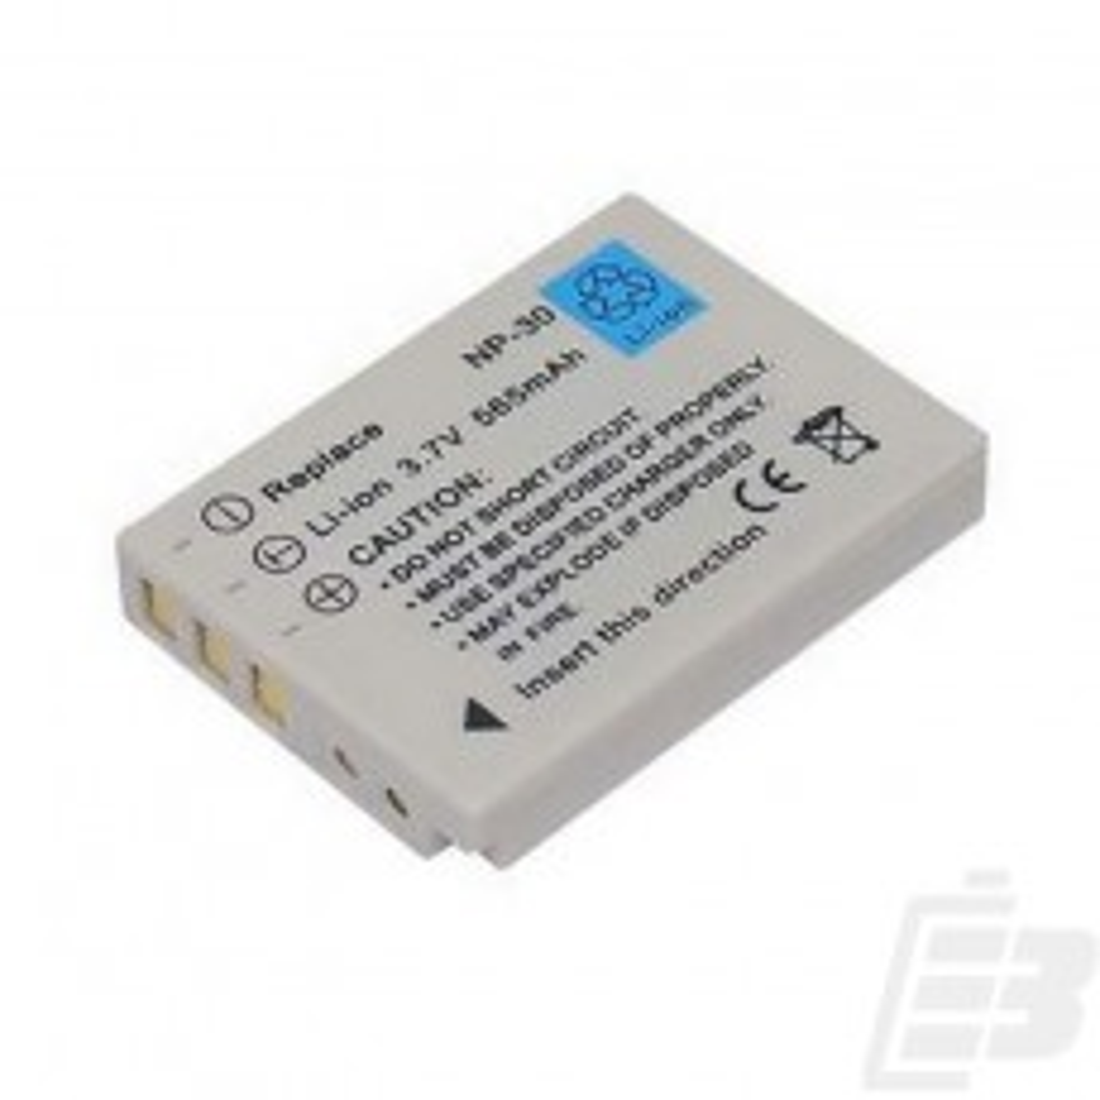 Camera battery Fujifilm NP-30_1